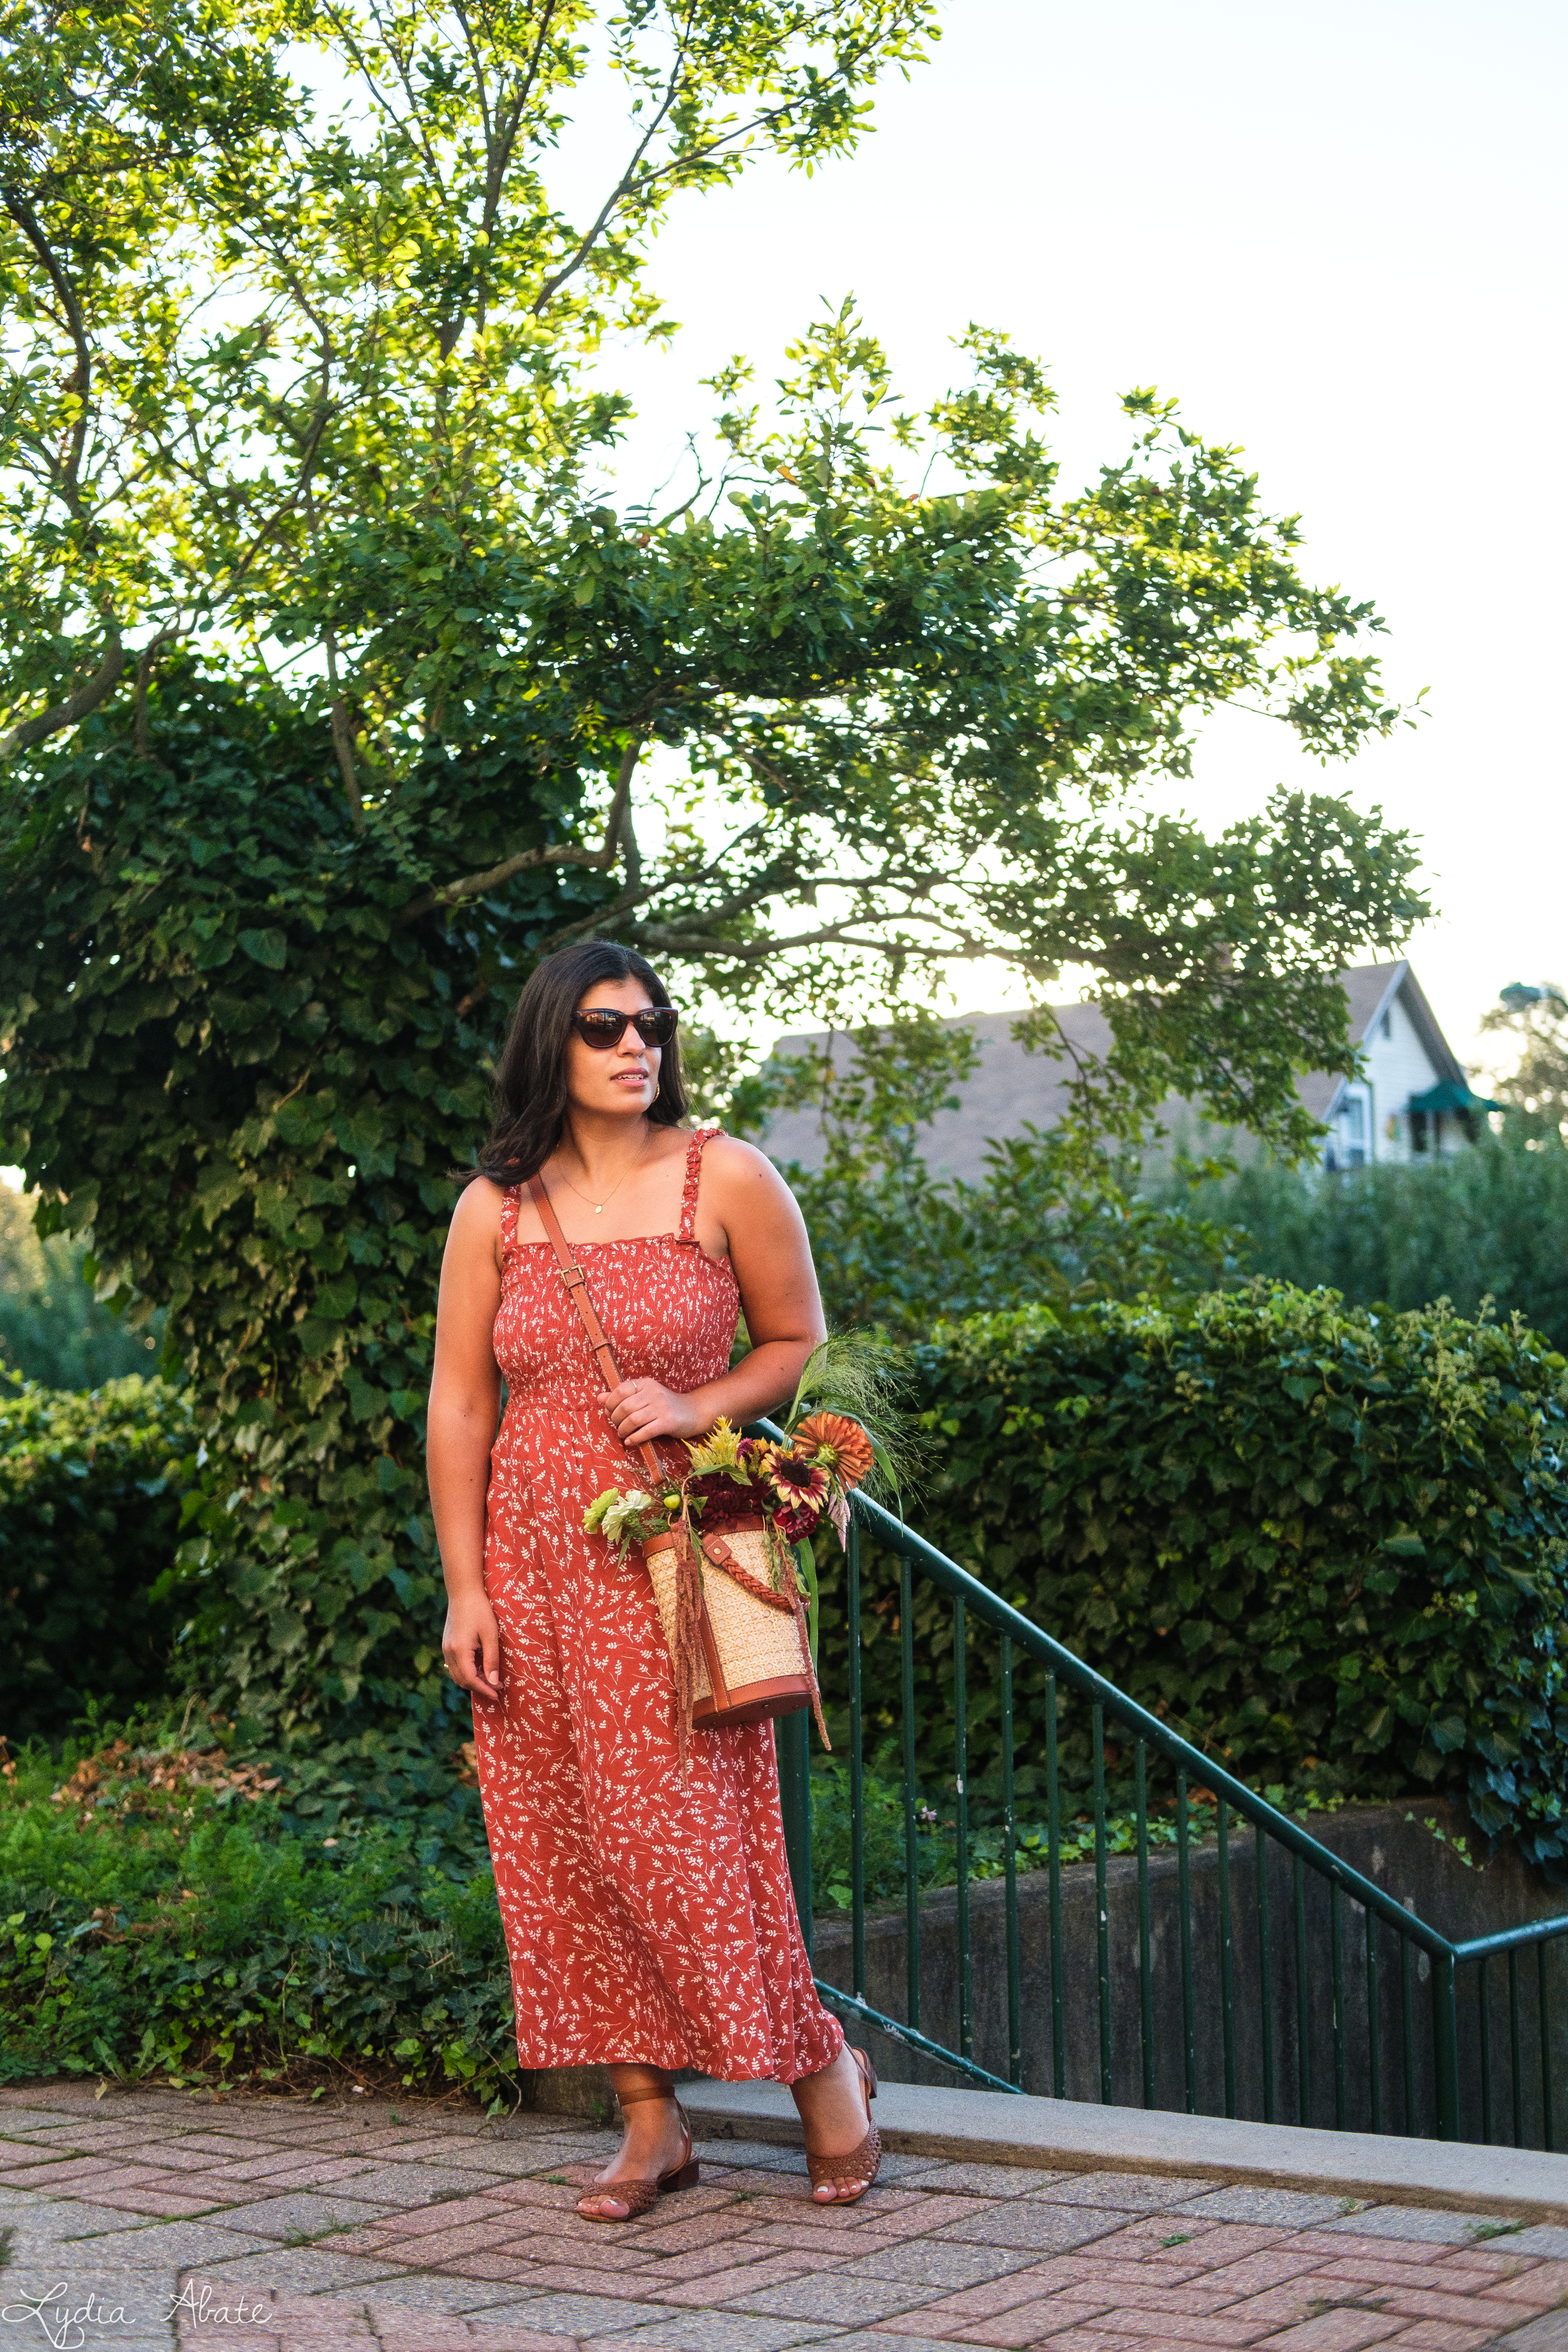 shirred rust floral maxi dress, caned bucket bag, brown sandals-10.jpg